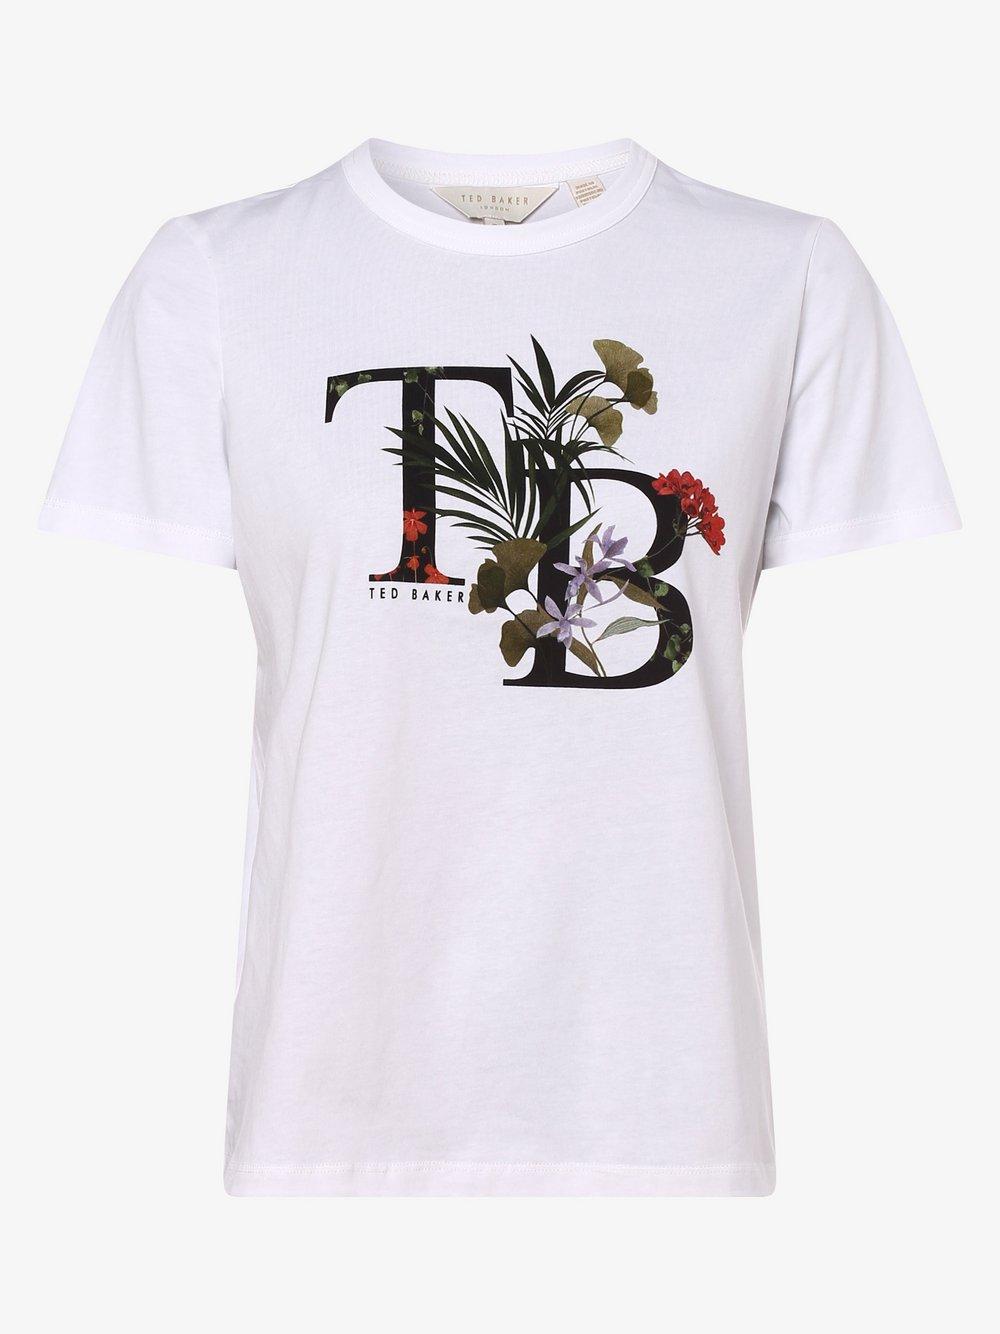 Ted Baker - T-shirt damski – Aymelia, biały